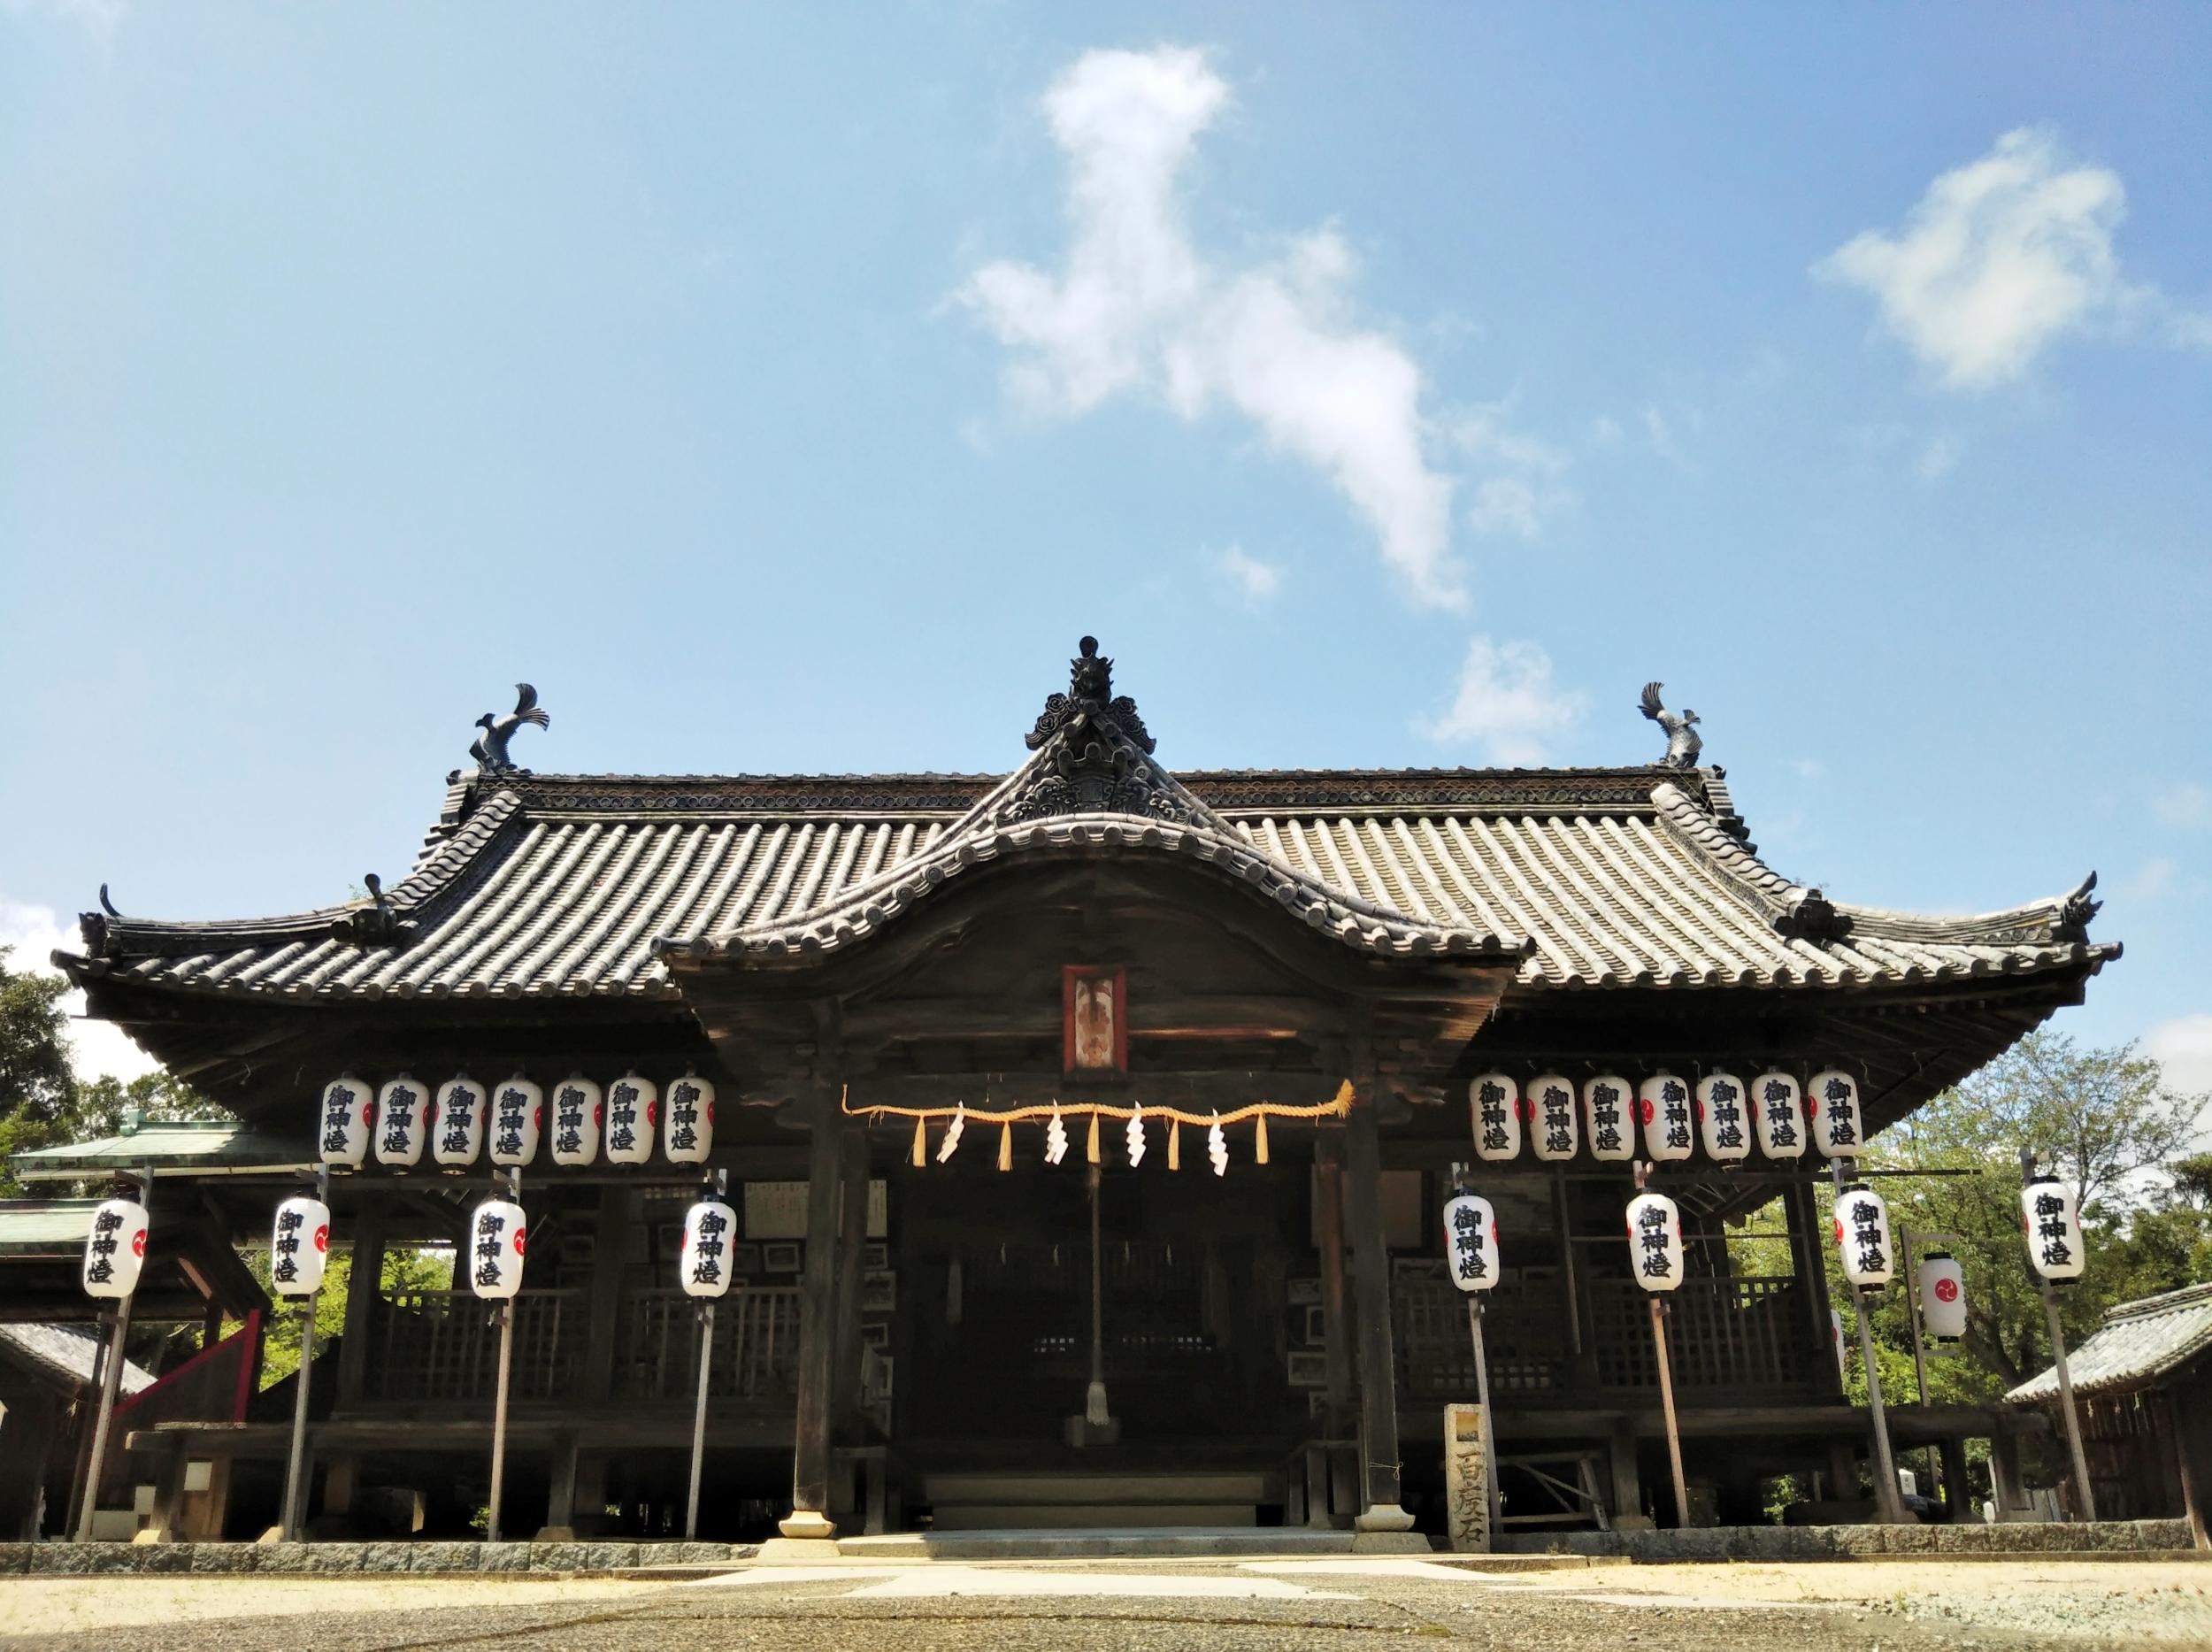 小豆島 内海八幡神社 公式サイト